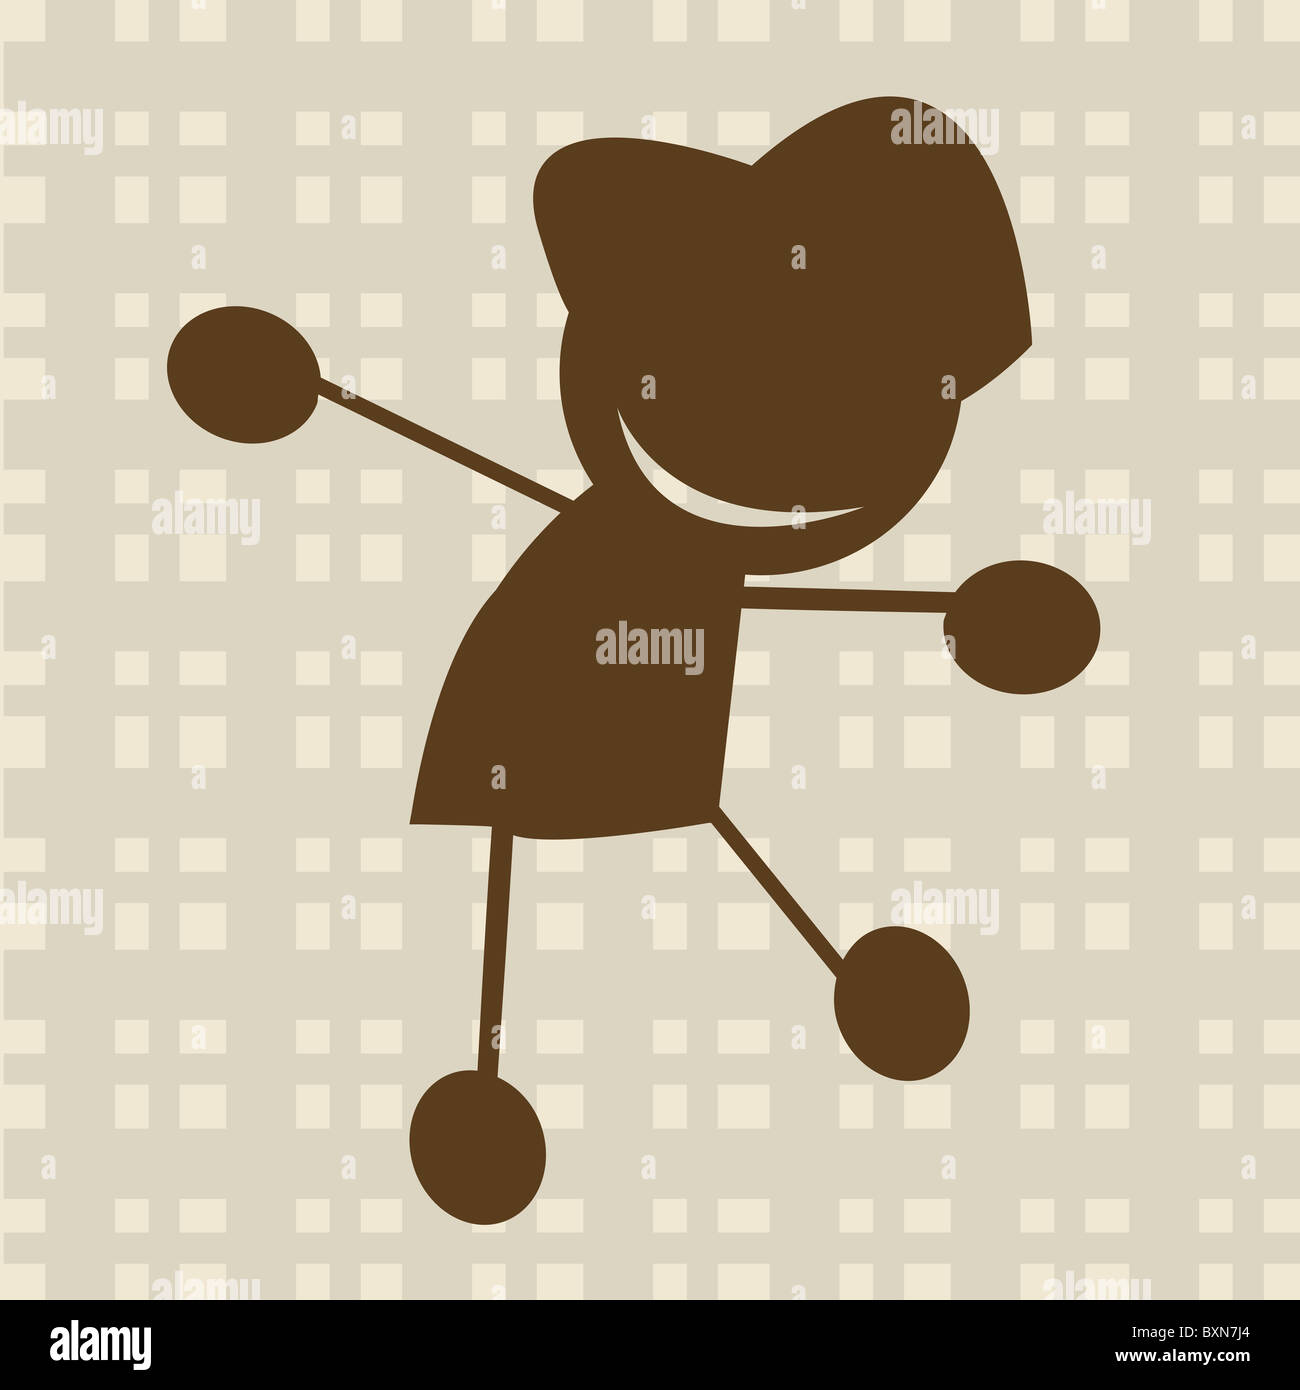 Kid illustration - Stock Image